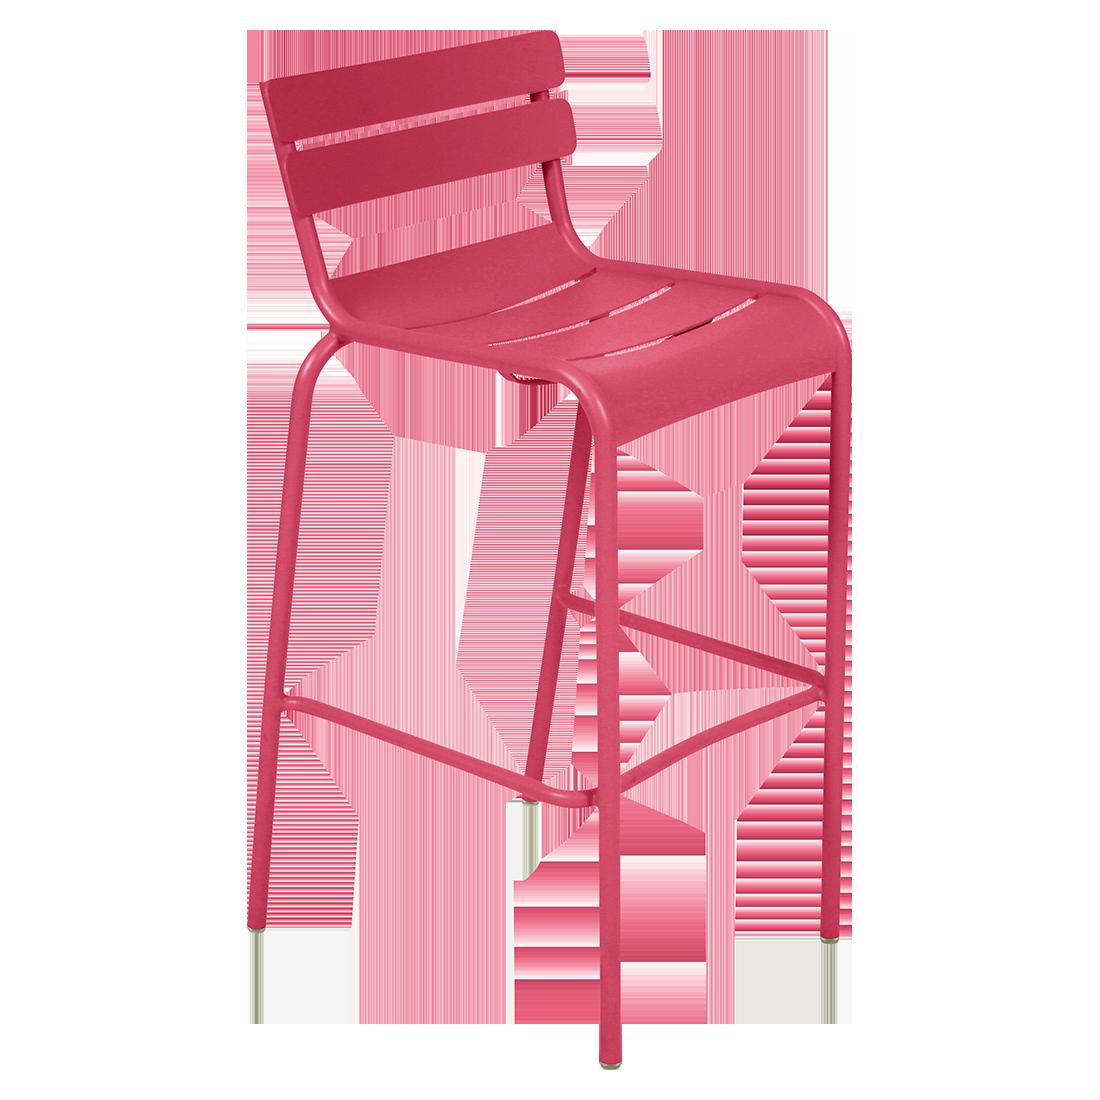 tabouret haut, tabouret de bar industriel, tabouret de bar, tabouret de bar metal, tabouret de bar rose